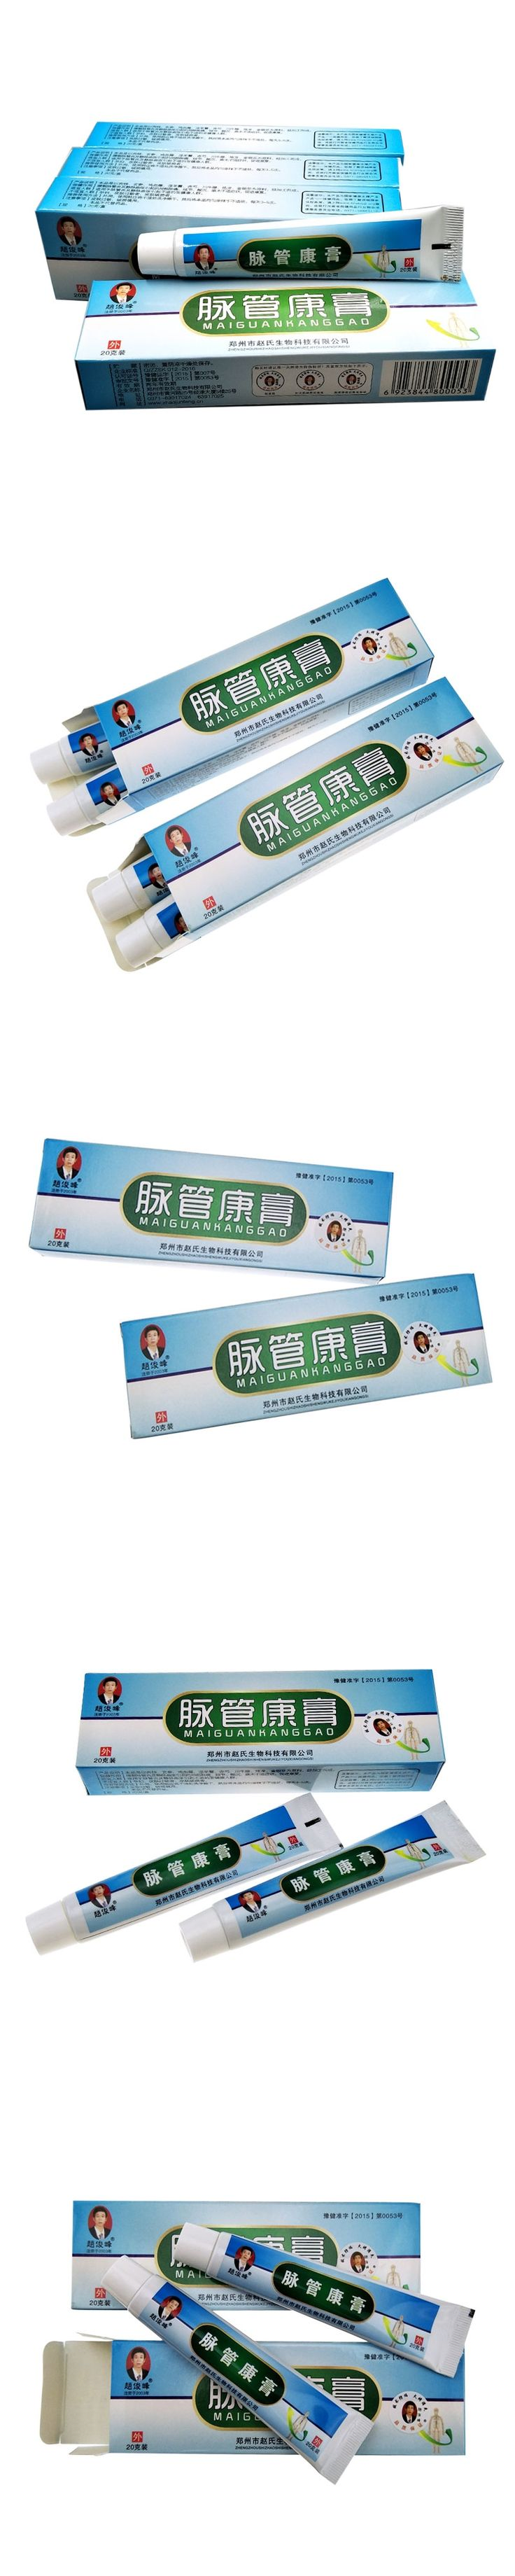 4Pcs Chinese Medicine Varicose Veins Treatment Leg Acid Bilges Itching Earthworm Lumps Old Bad Leg Vasculitis Cream Spider Veins